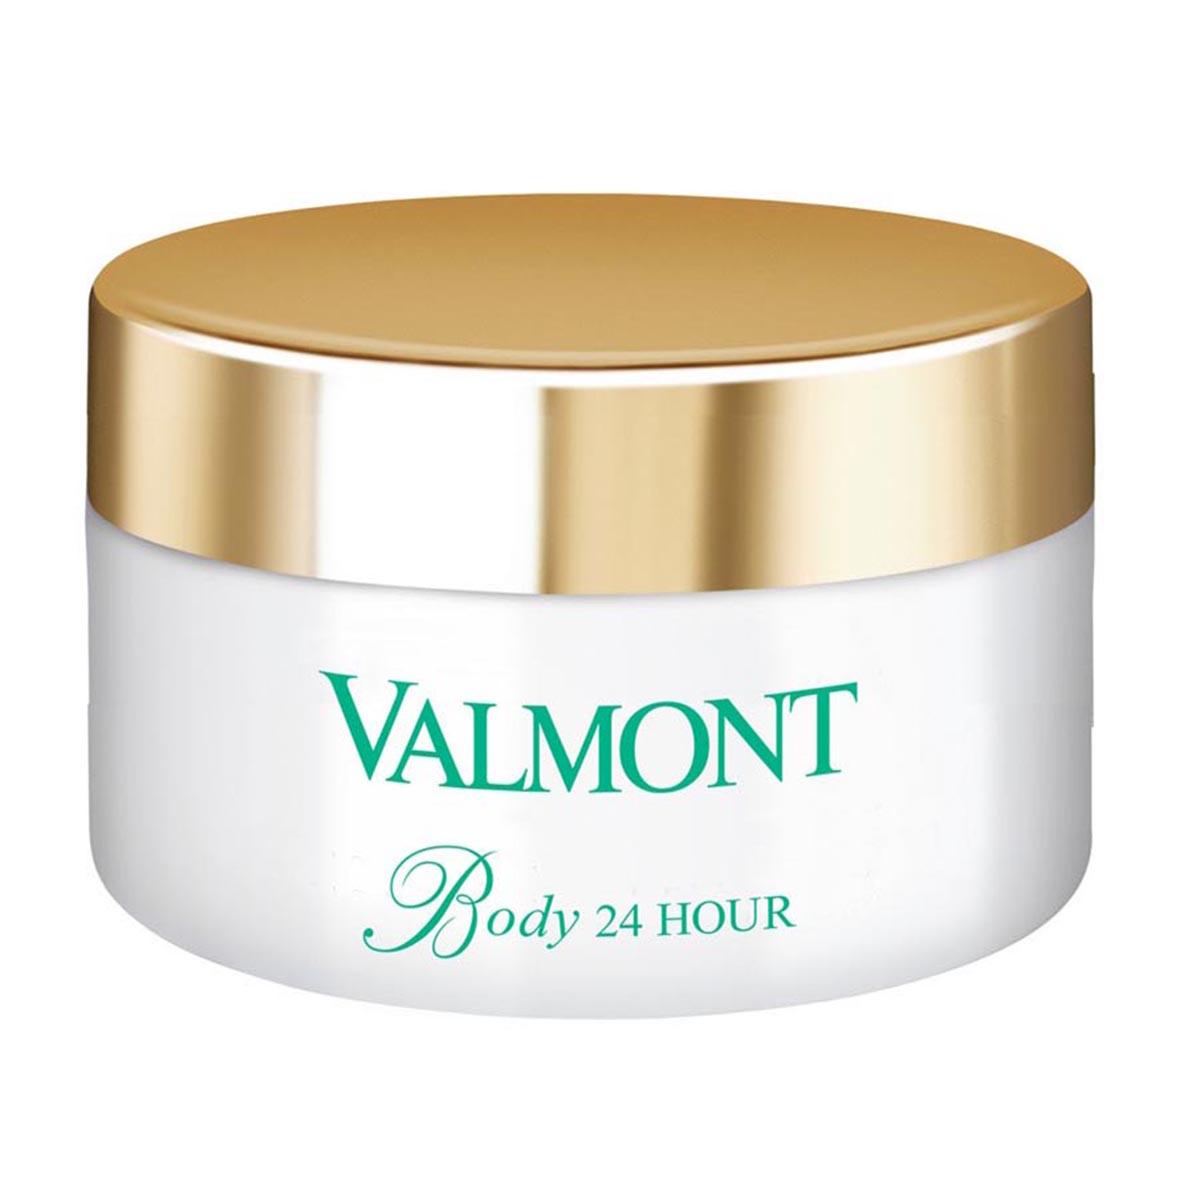 Valmont body 24 hour 100ml